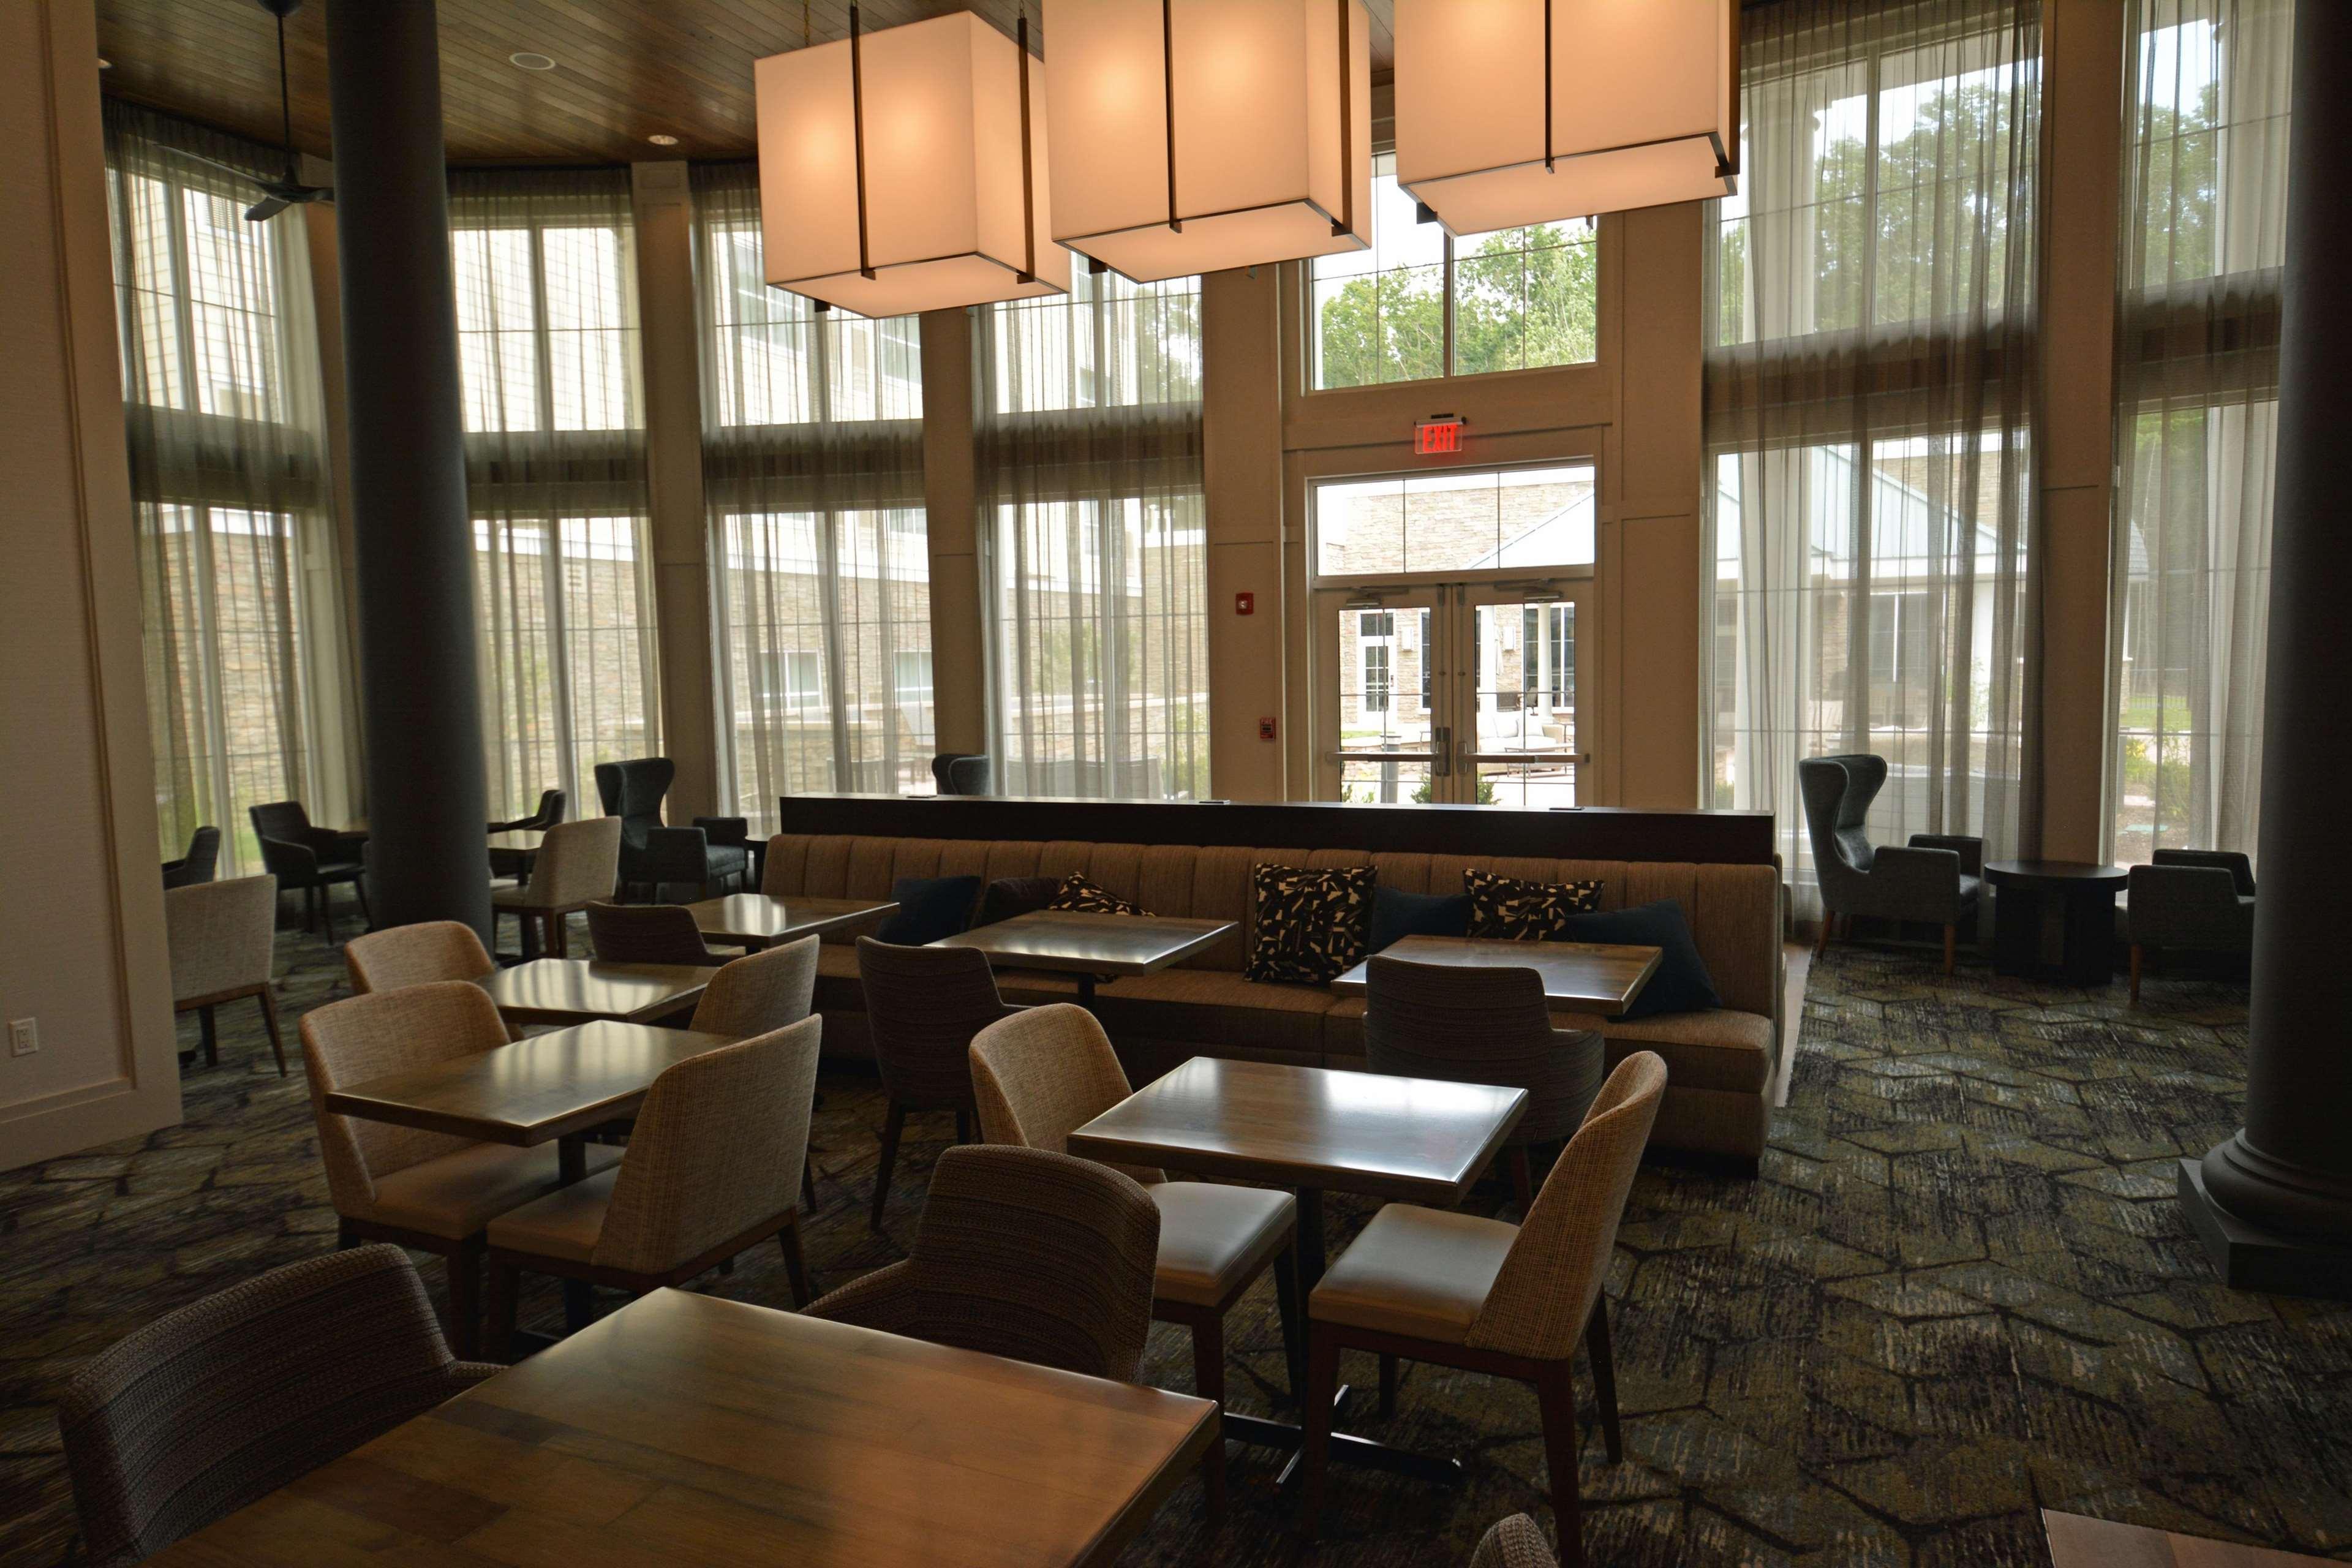 Homewood Suites by Hilton Saratoga Springs image 9